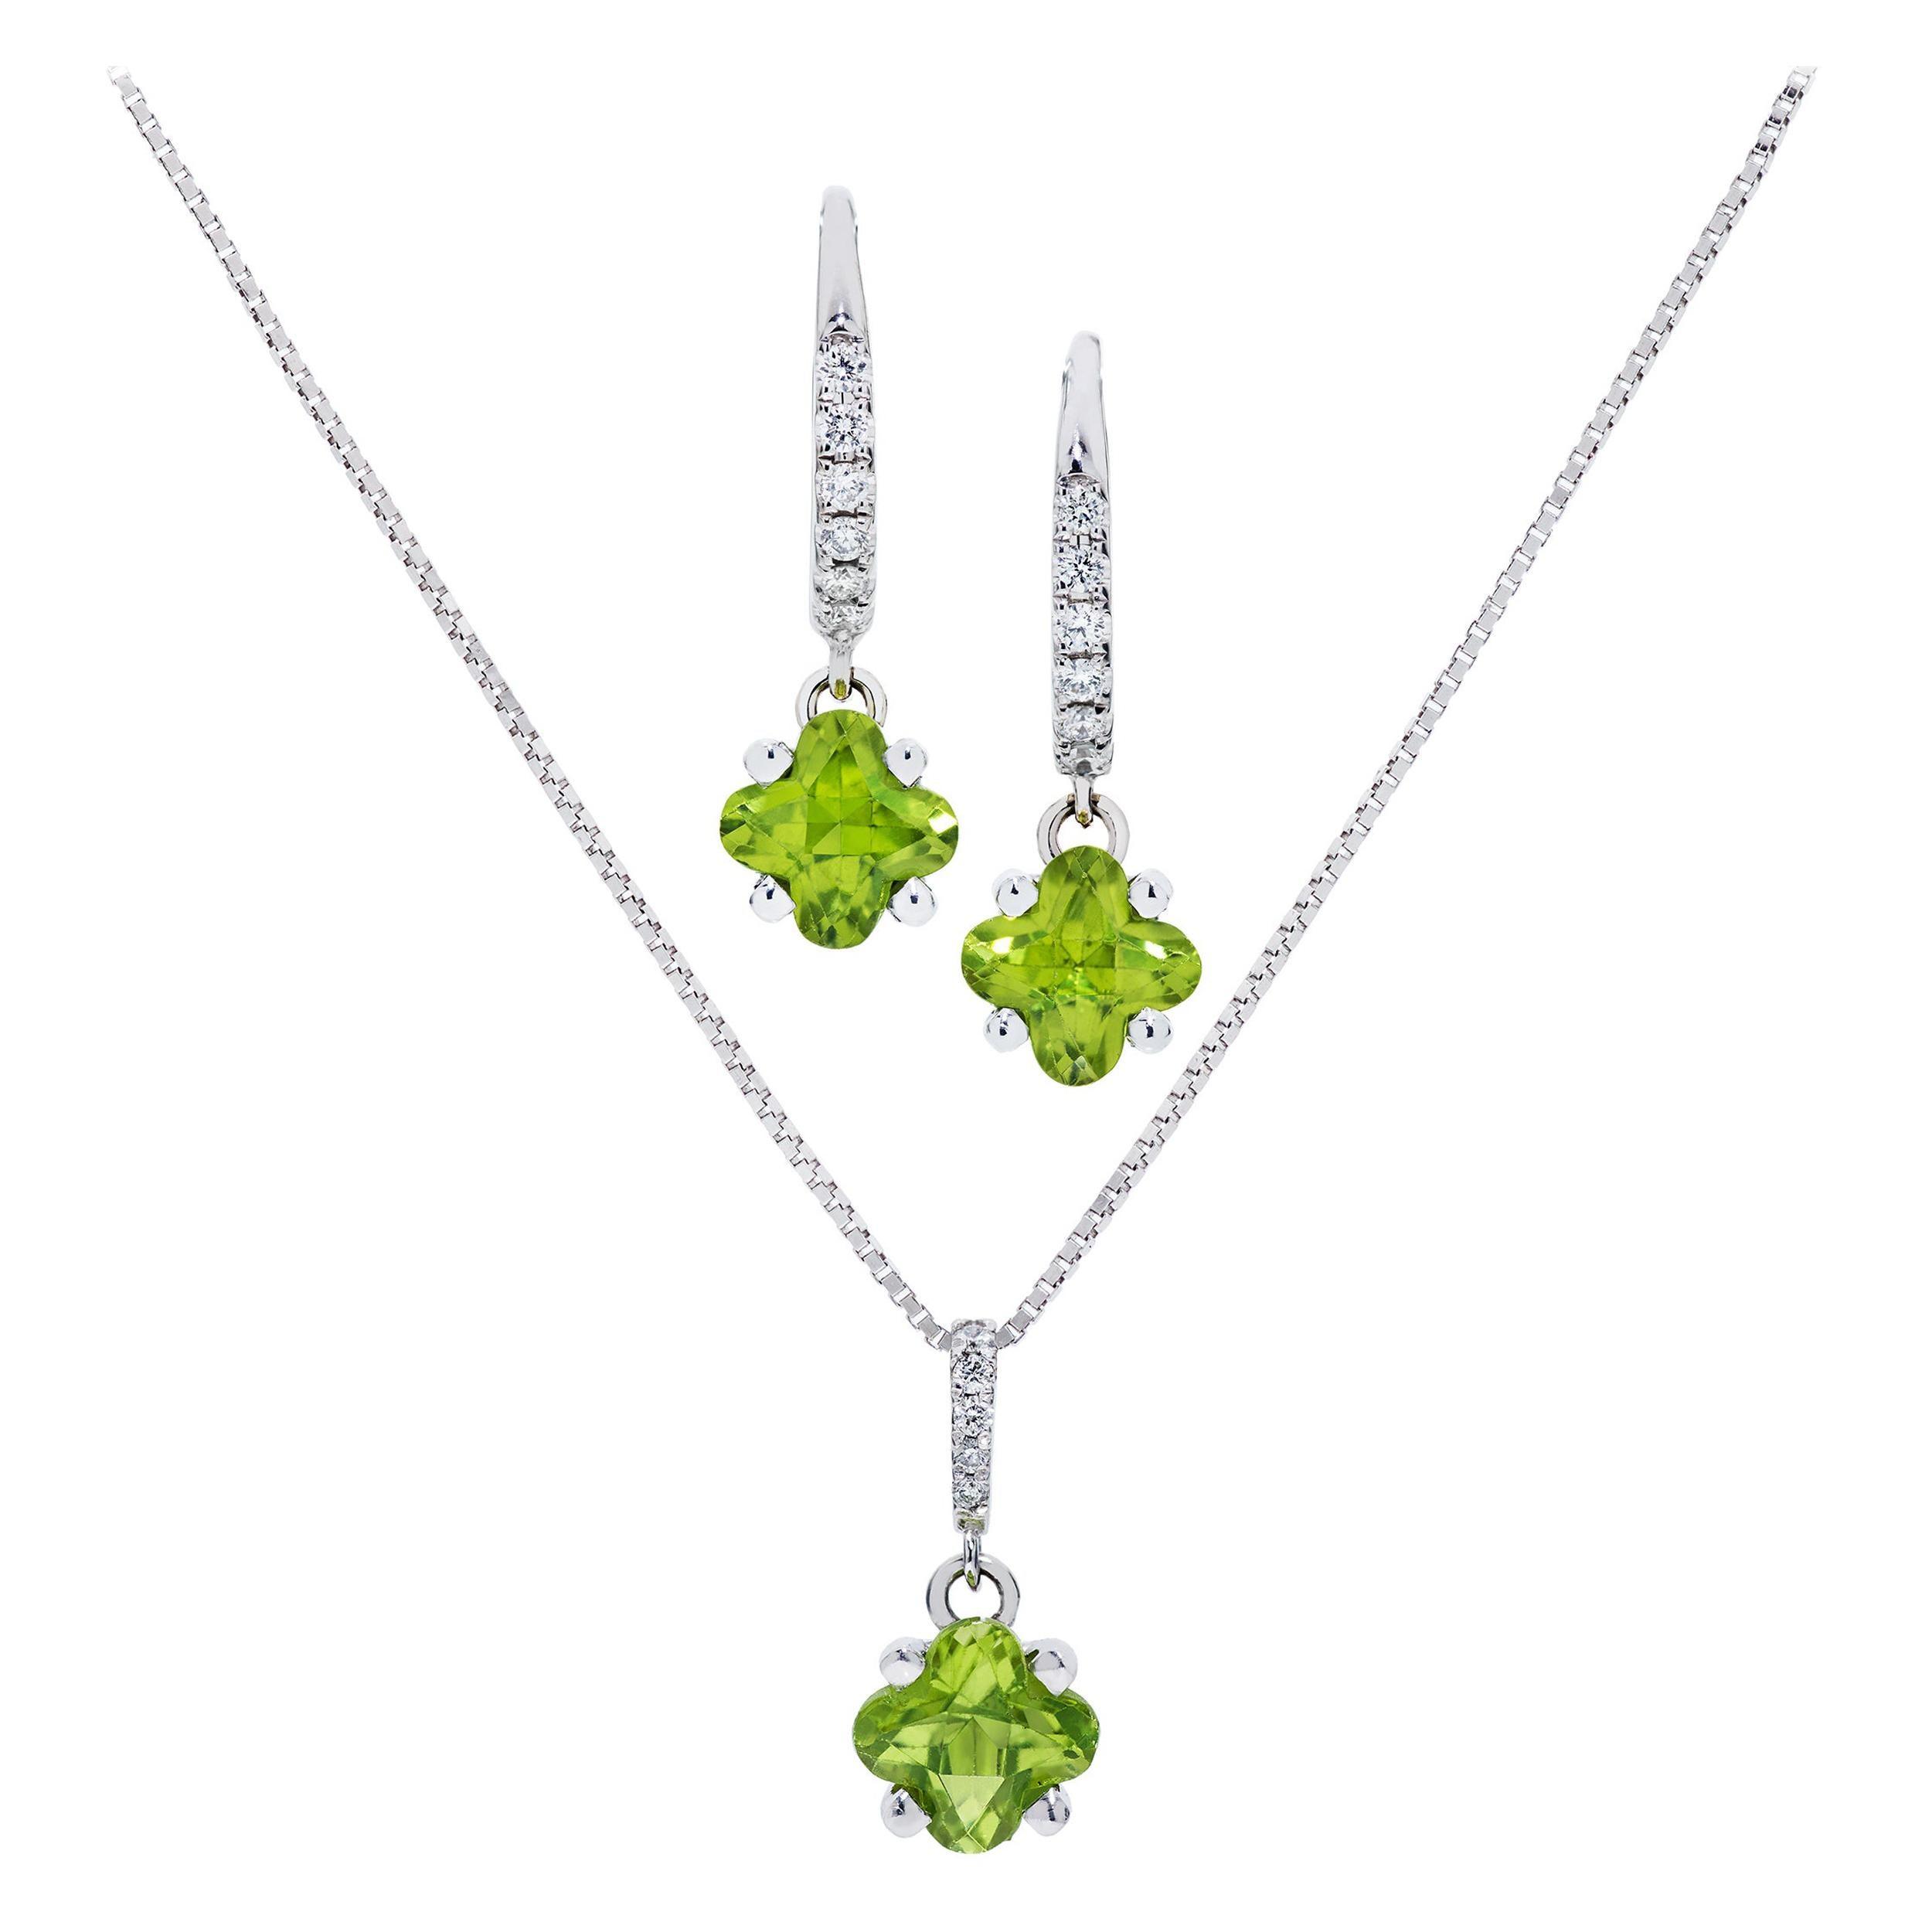 2.46 Carats Clover-Shaped Peridot & Diamond Necklace/Earring Set in 18 Karat WG